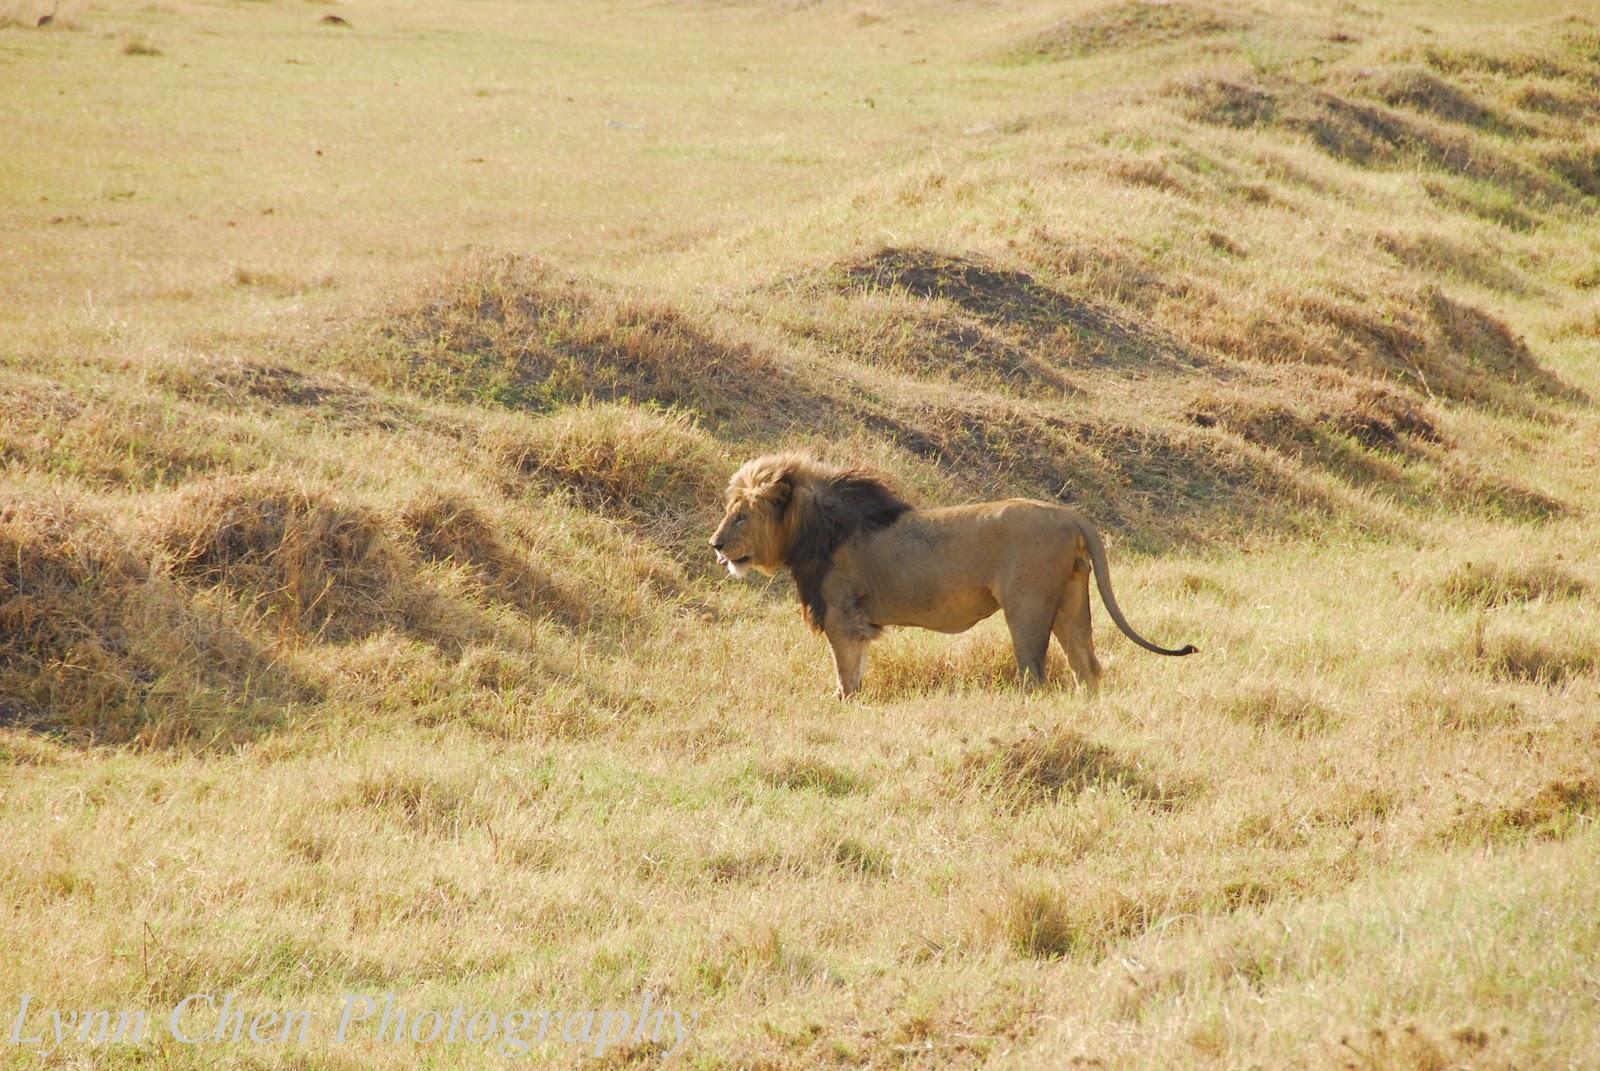 http://2.bp.blogspot.com/-KKRtH3inzQQ/TvGYglYZ6CI/AAAAAAAAAqs/yCkVjOAYJY0/s1600/LR+Ngorongoro-094.jpg